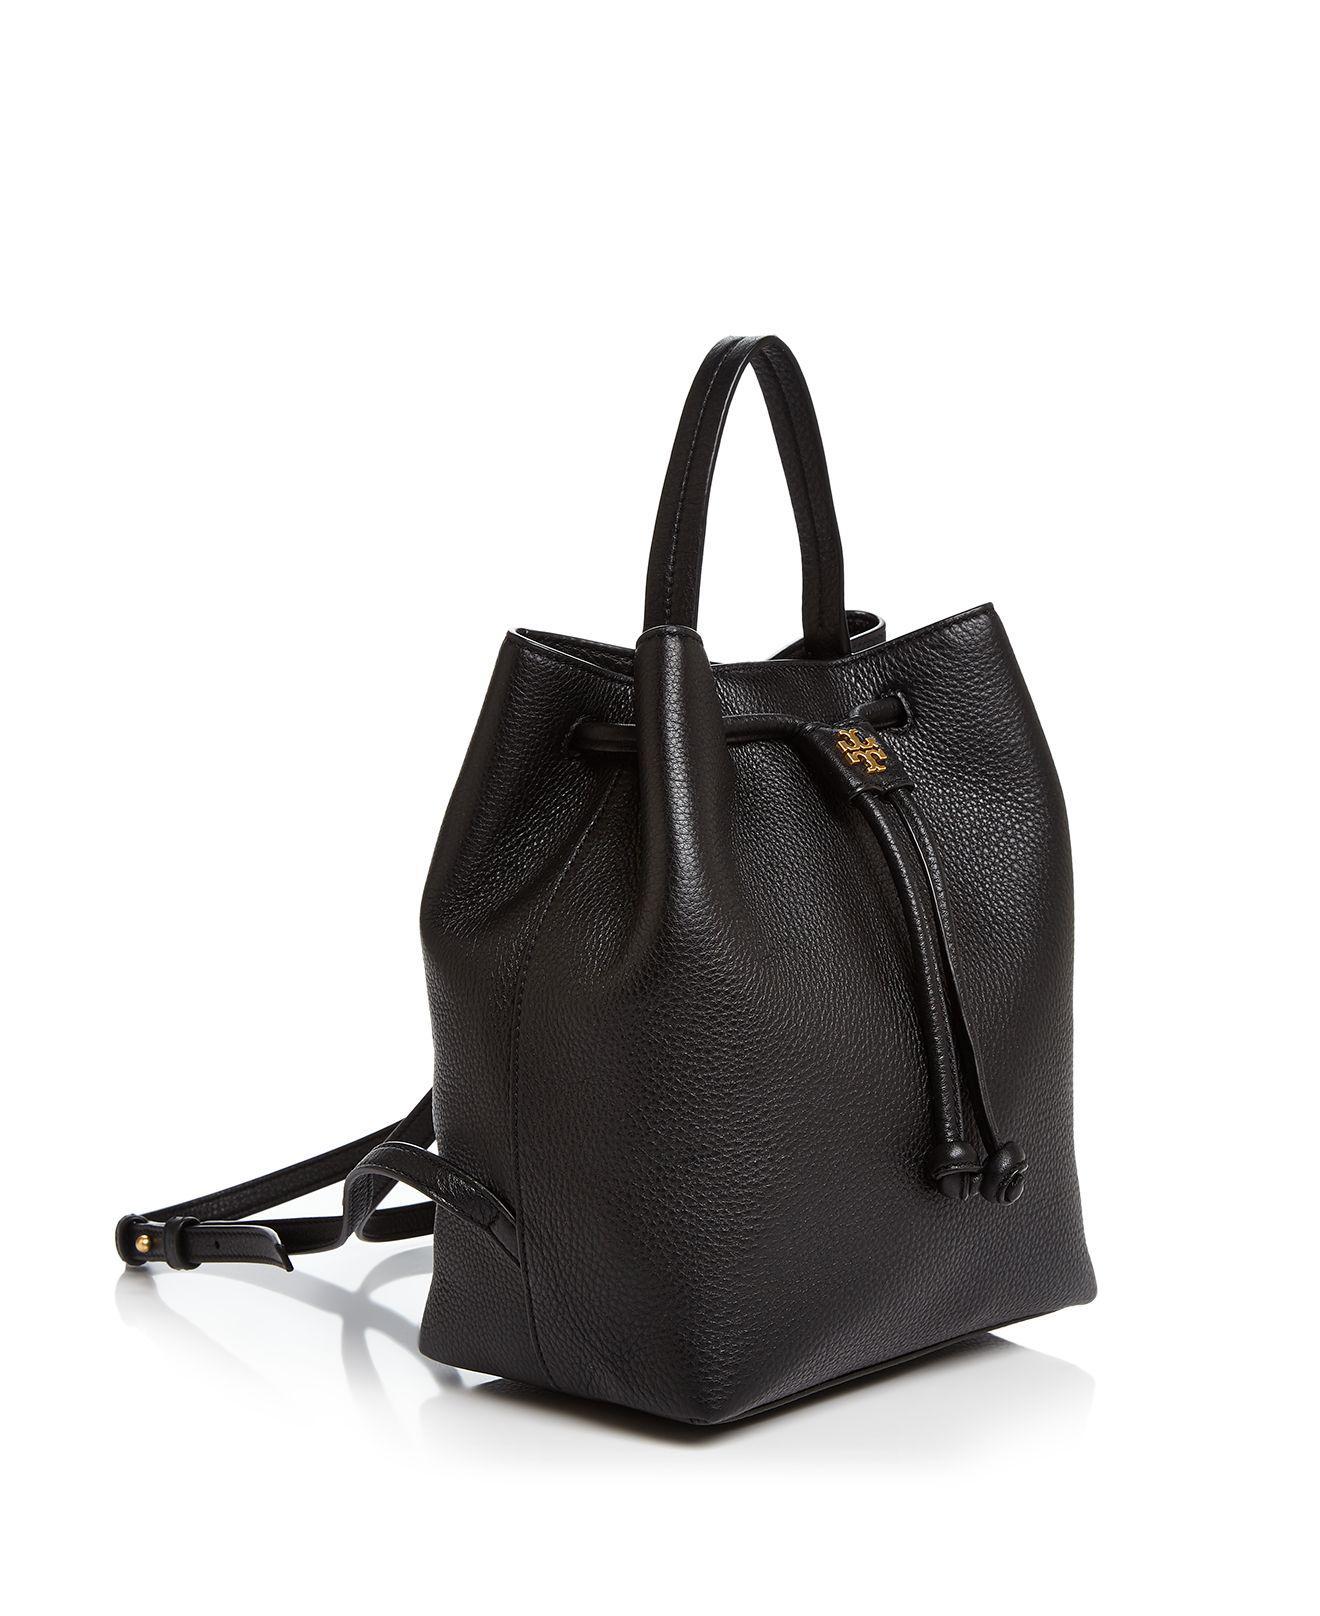 004d8b3b28 Lyst - Tory Burch Georgia Pebbled Leather Backpack in Black